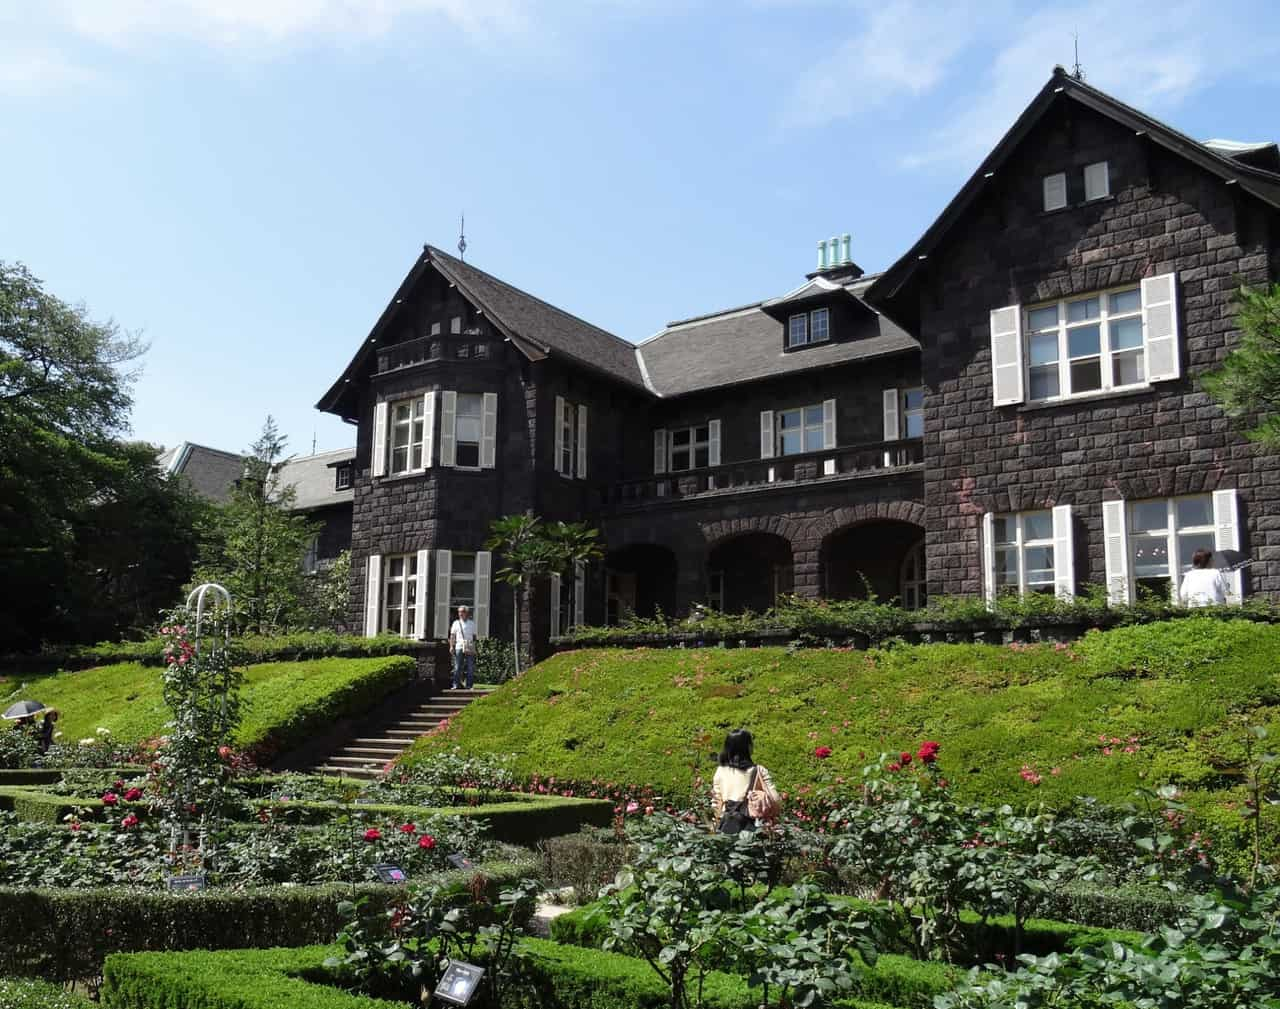 Jardin de Kyu Furukawa avec sa résidence